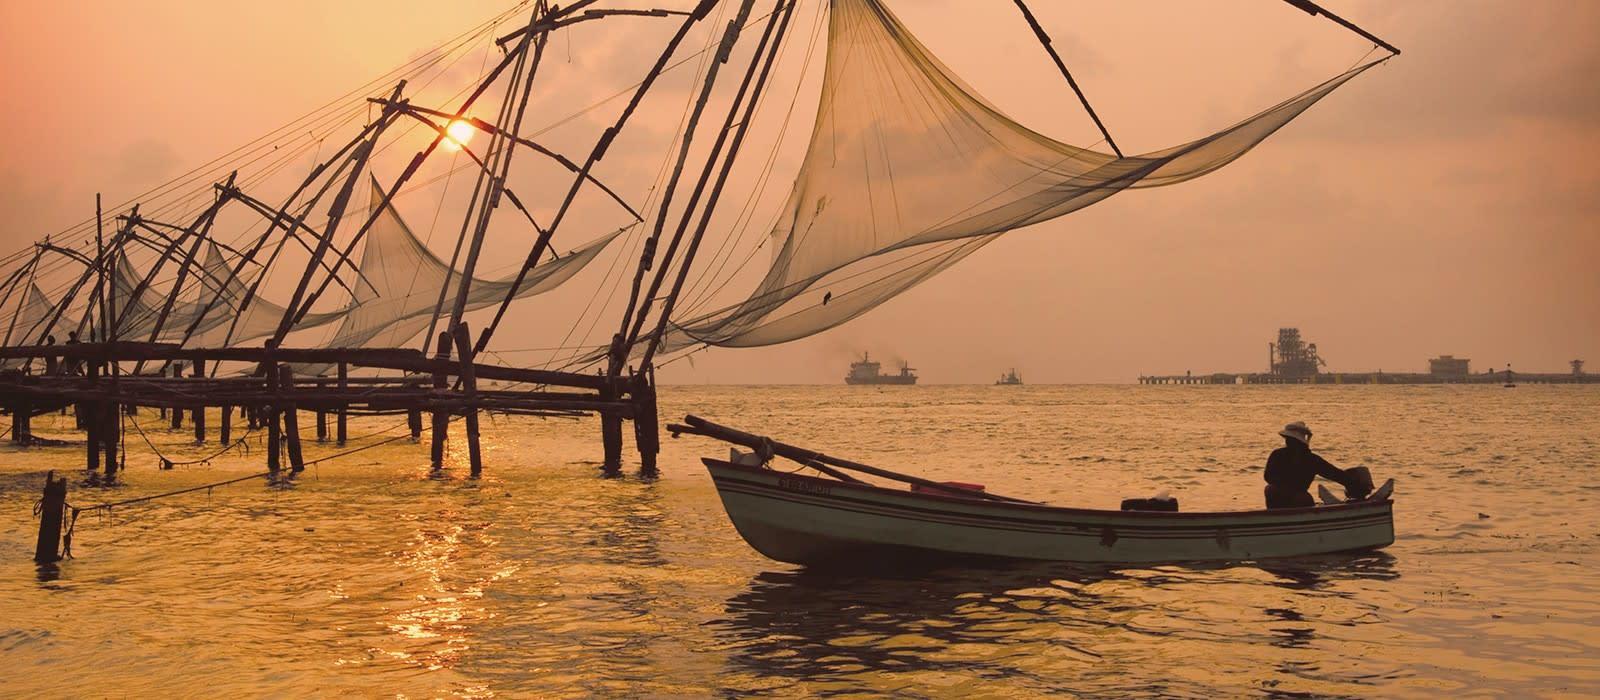 Kerala-Reise: Backwaters, Teeplantagen & Strand Urlaub 1